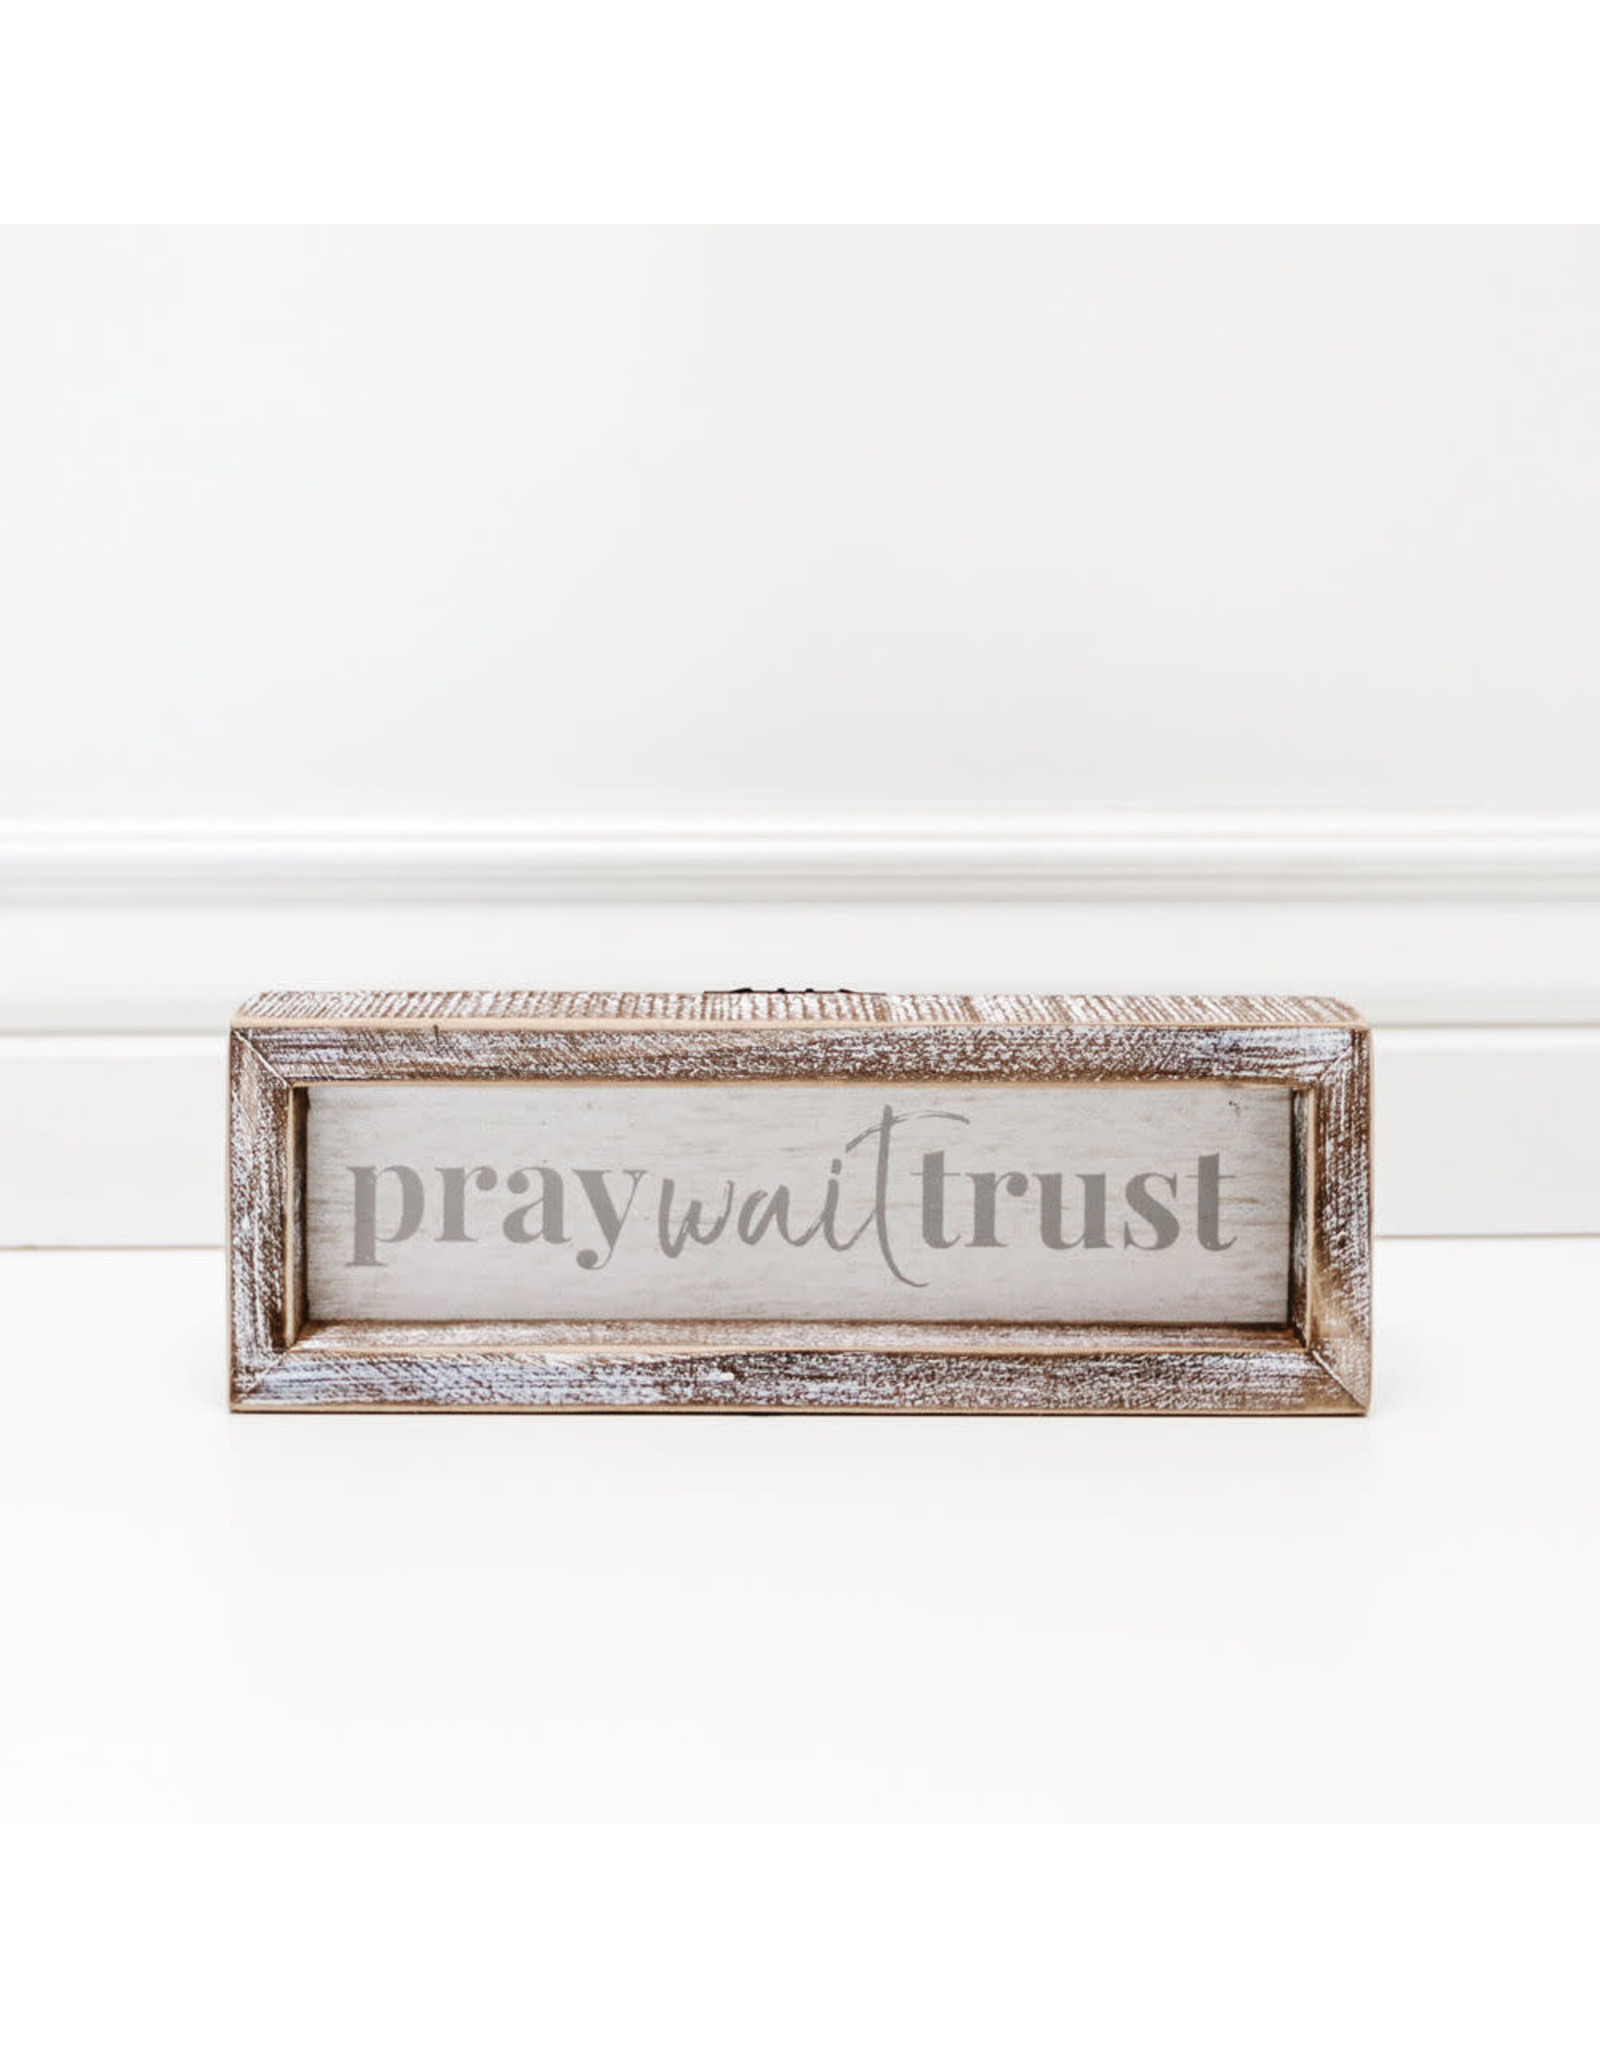 "Adams & Co. Pray Wait Trust 10"" X 3.5"" X 1.5"" Wood Framed Sign White/Gray"